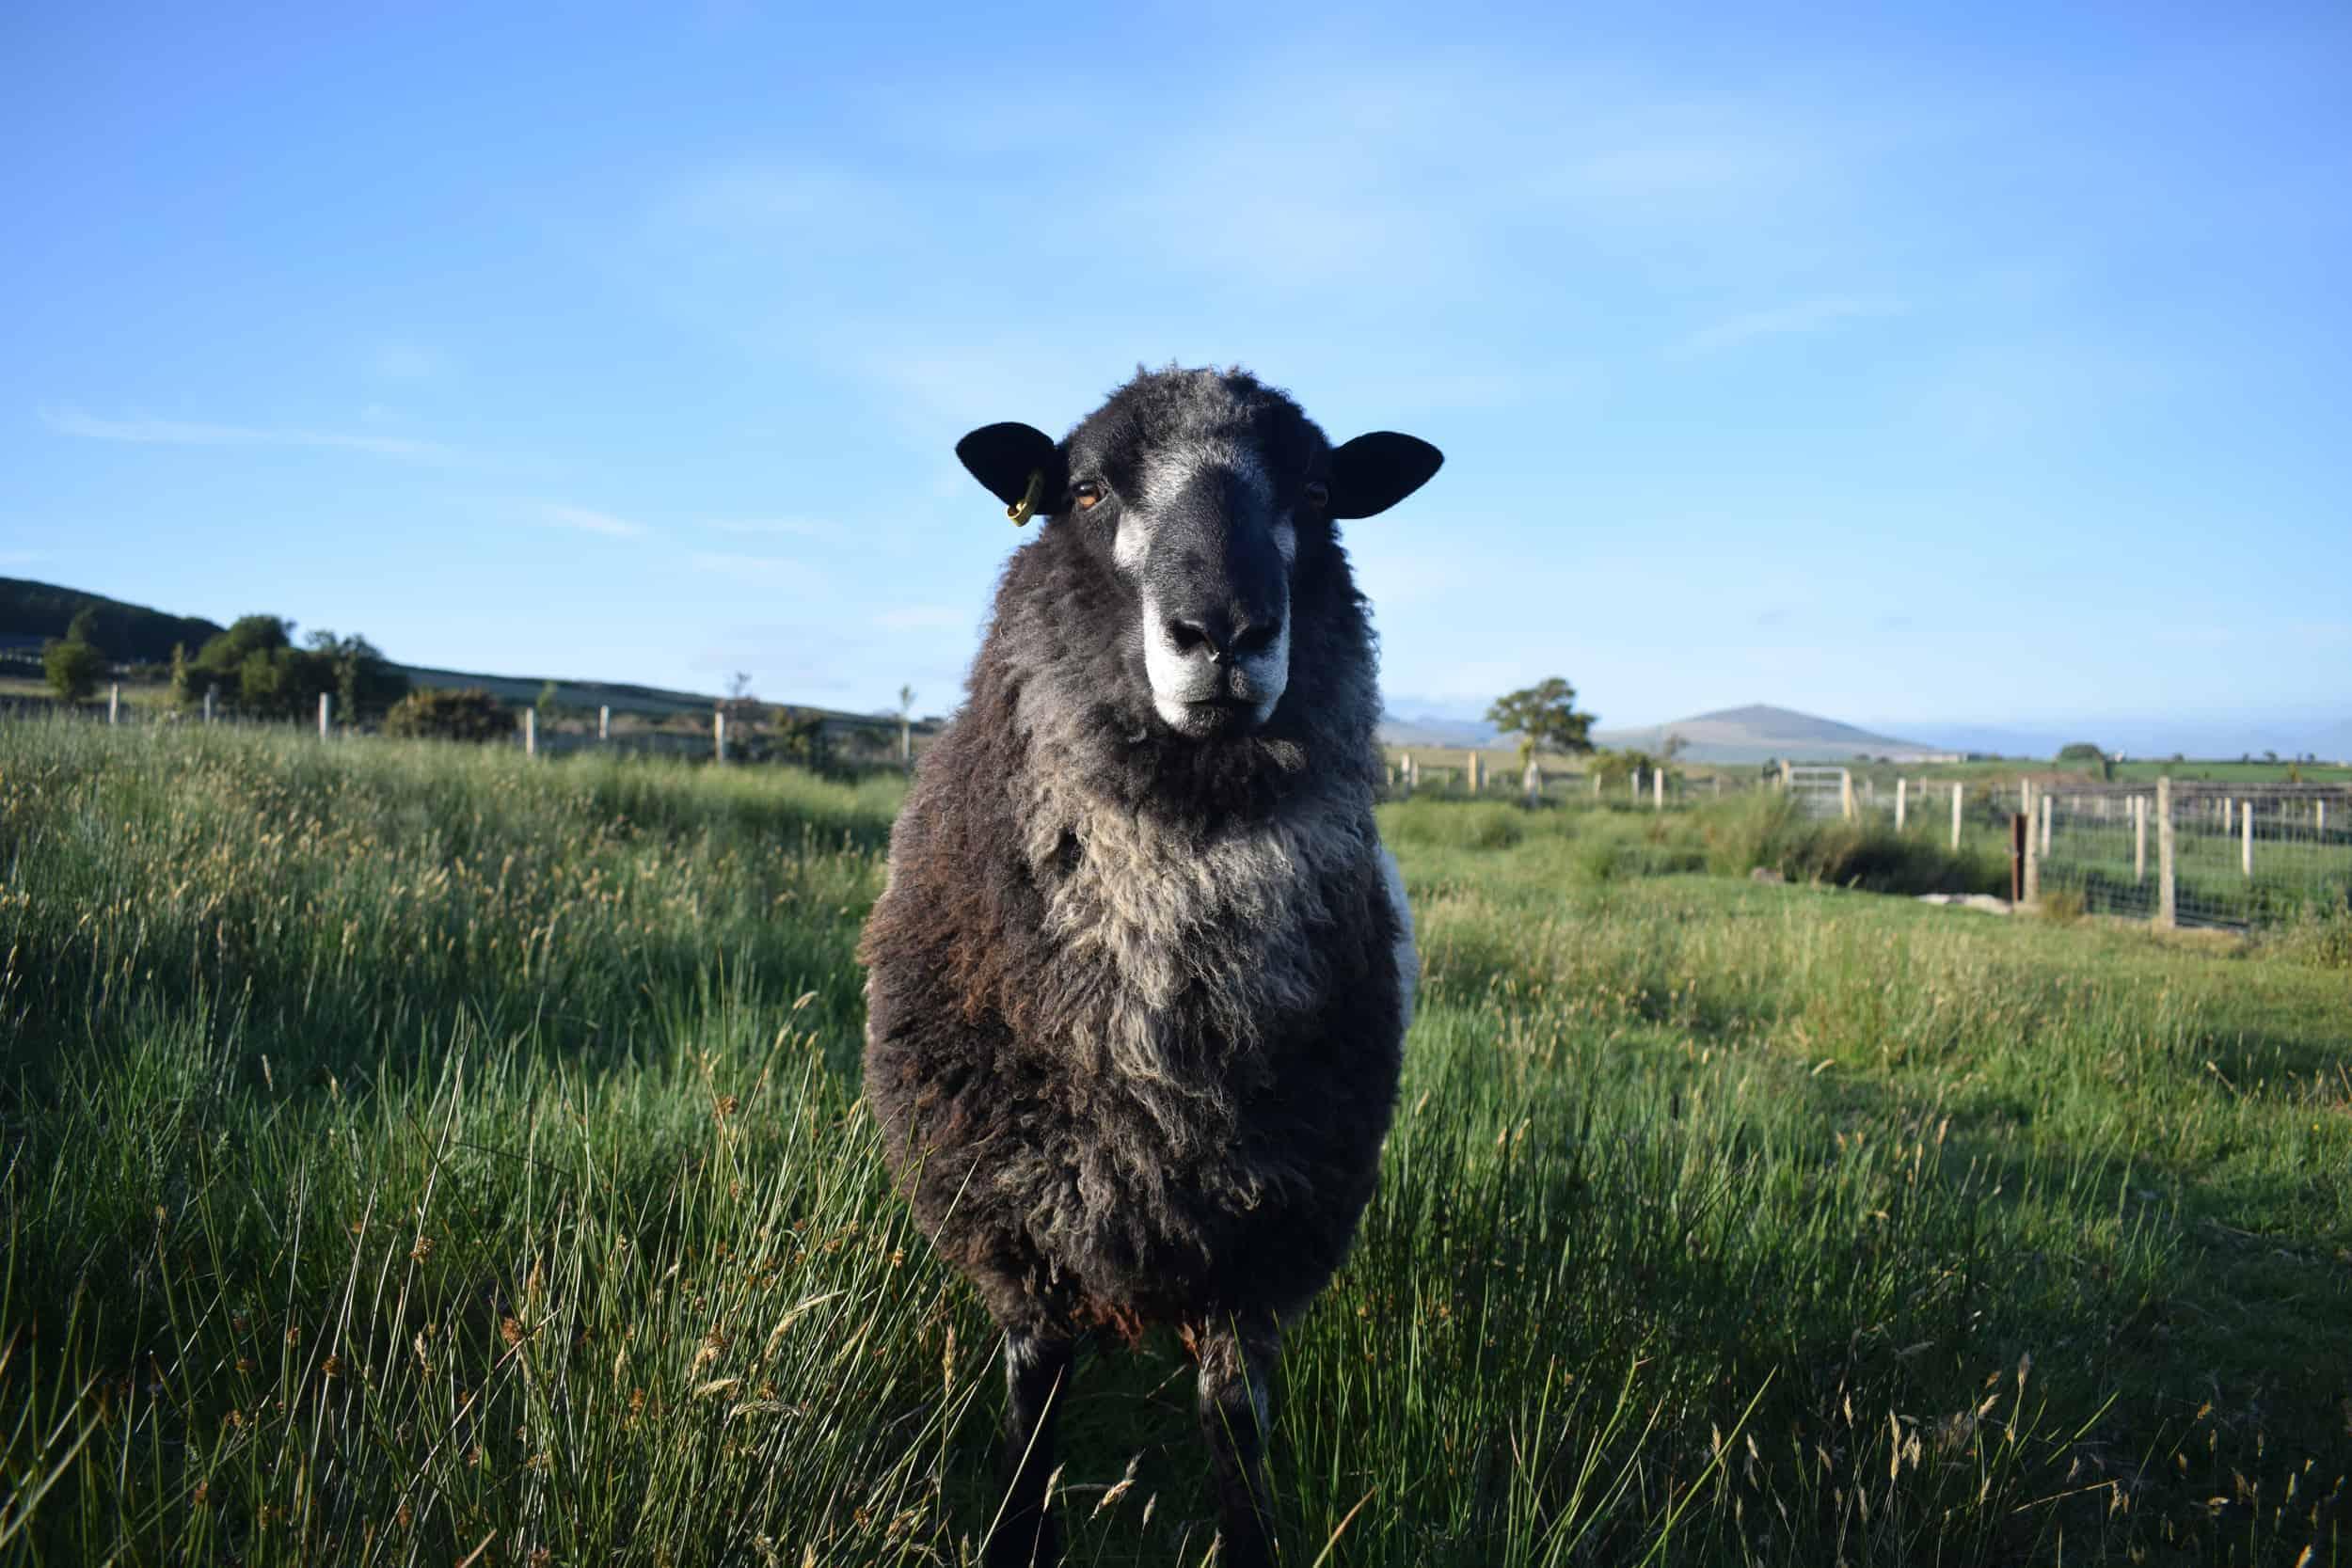 Bruno yearling ram coloured leicester longwool gotland shetland sheep crossbreed english blue kind fibre 5